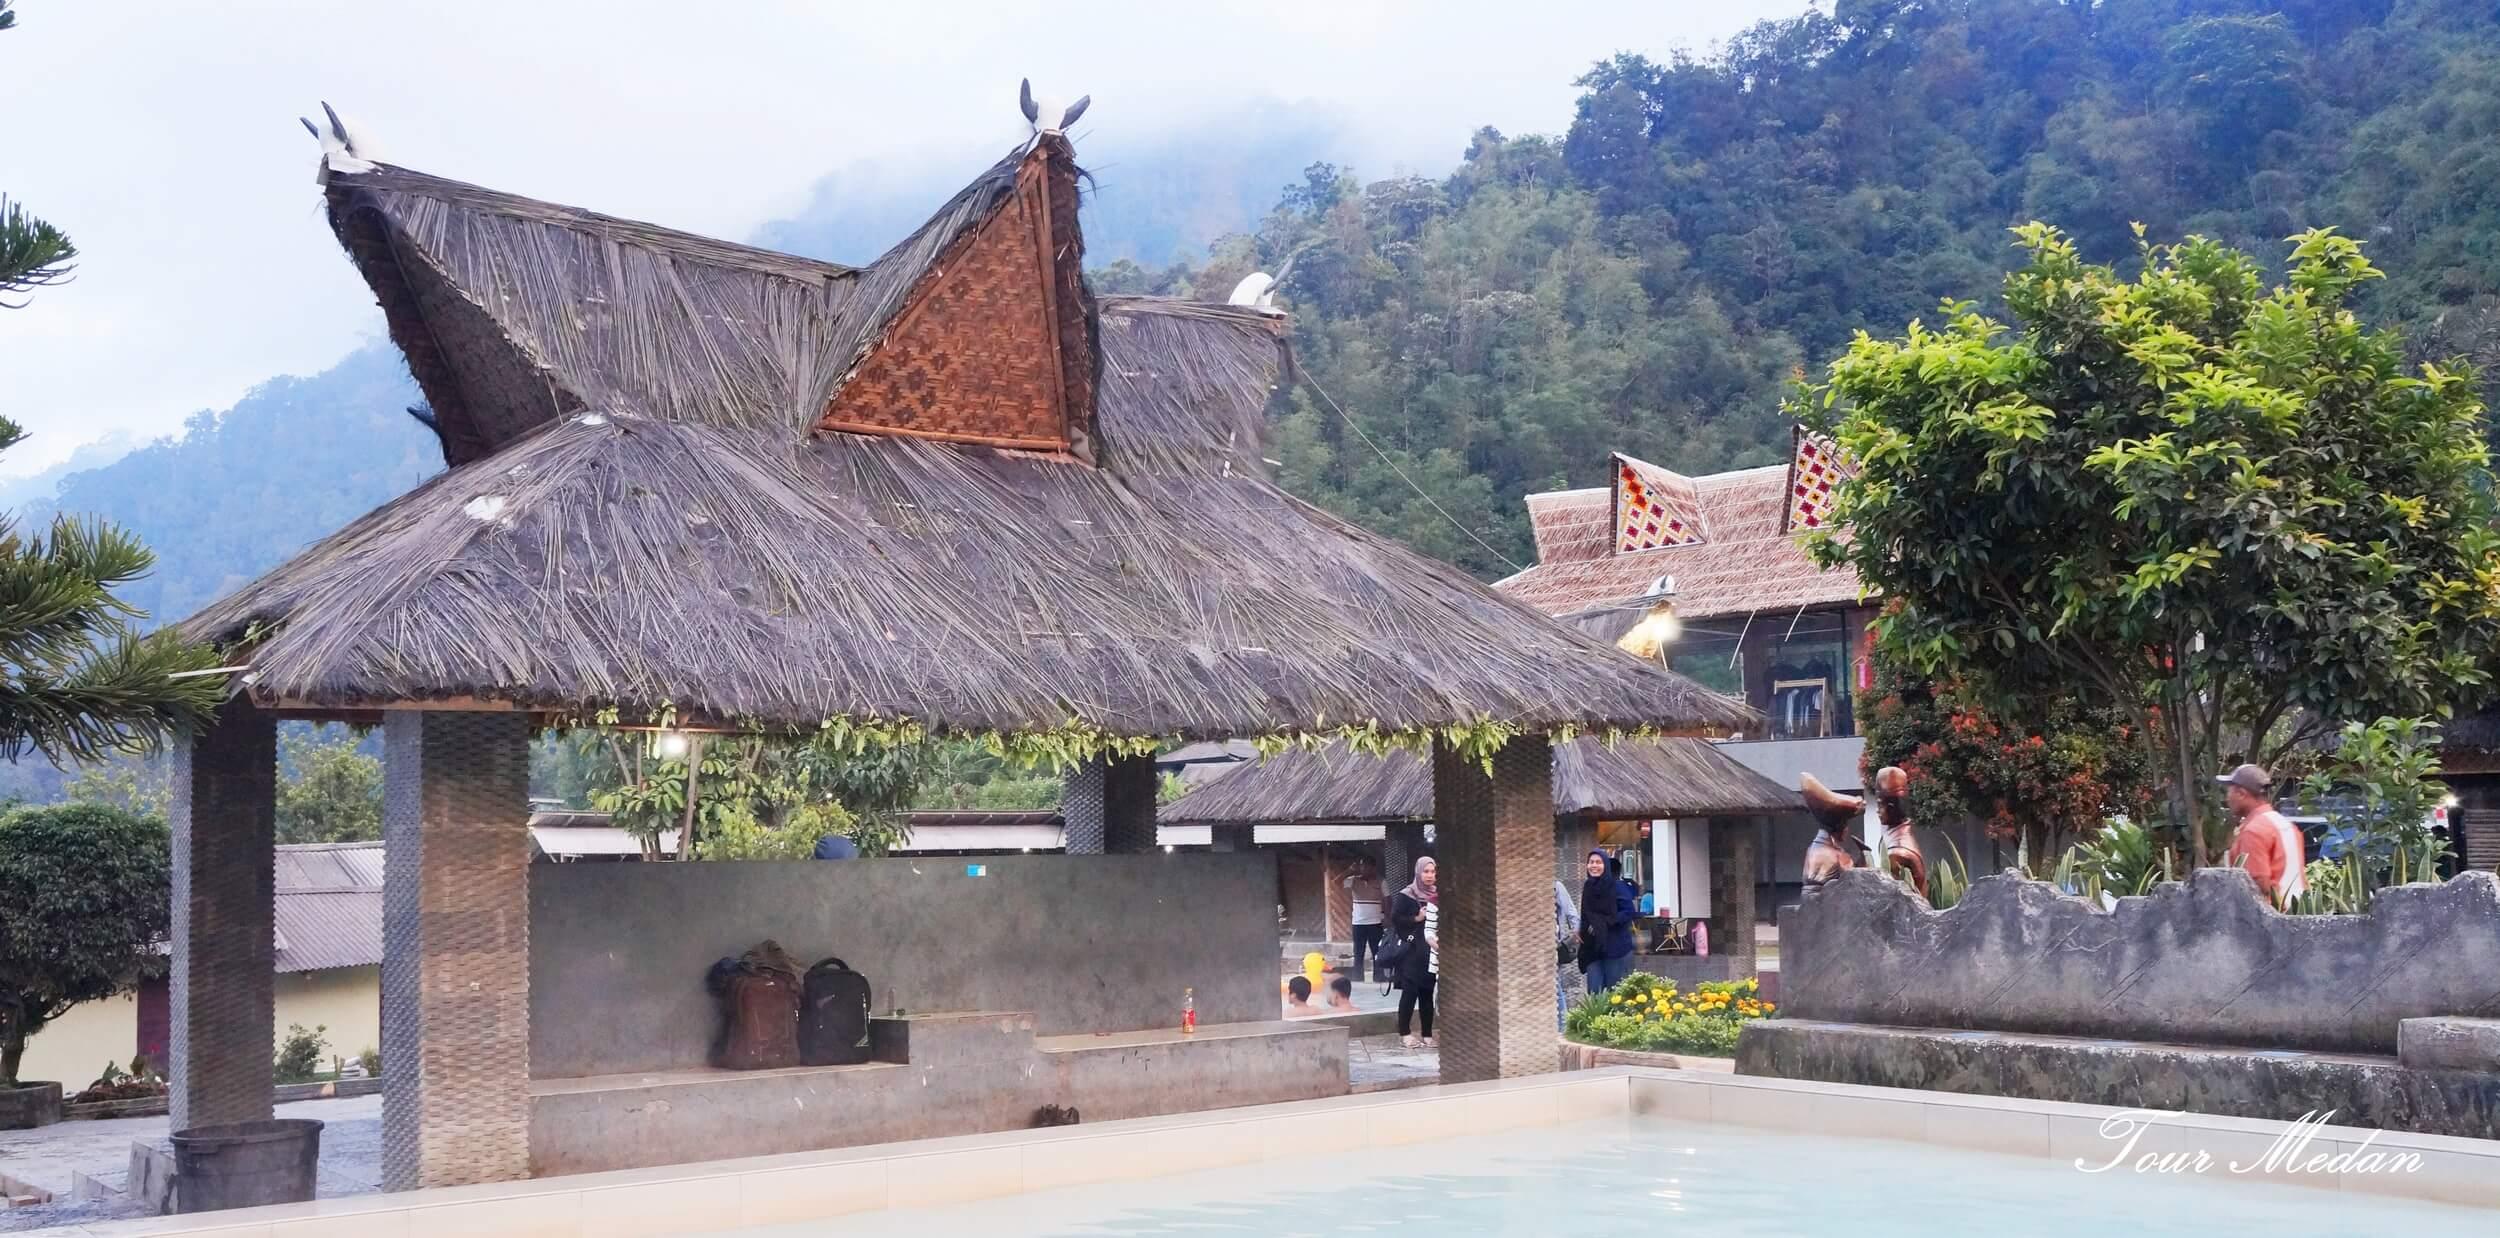 Asal Usul Orang Batak   Arsitektur Batak Karo